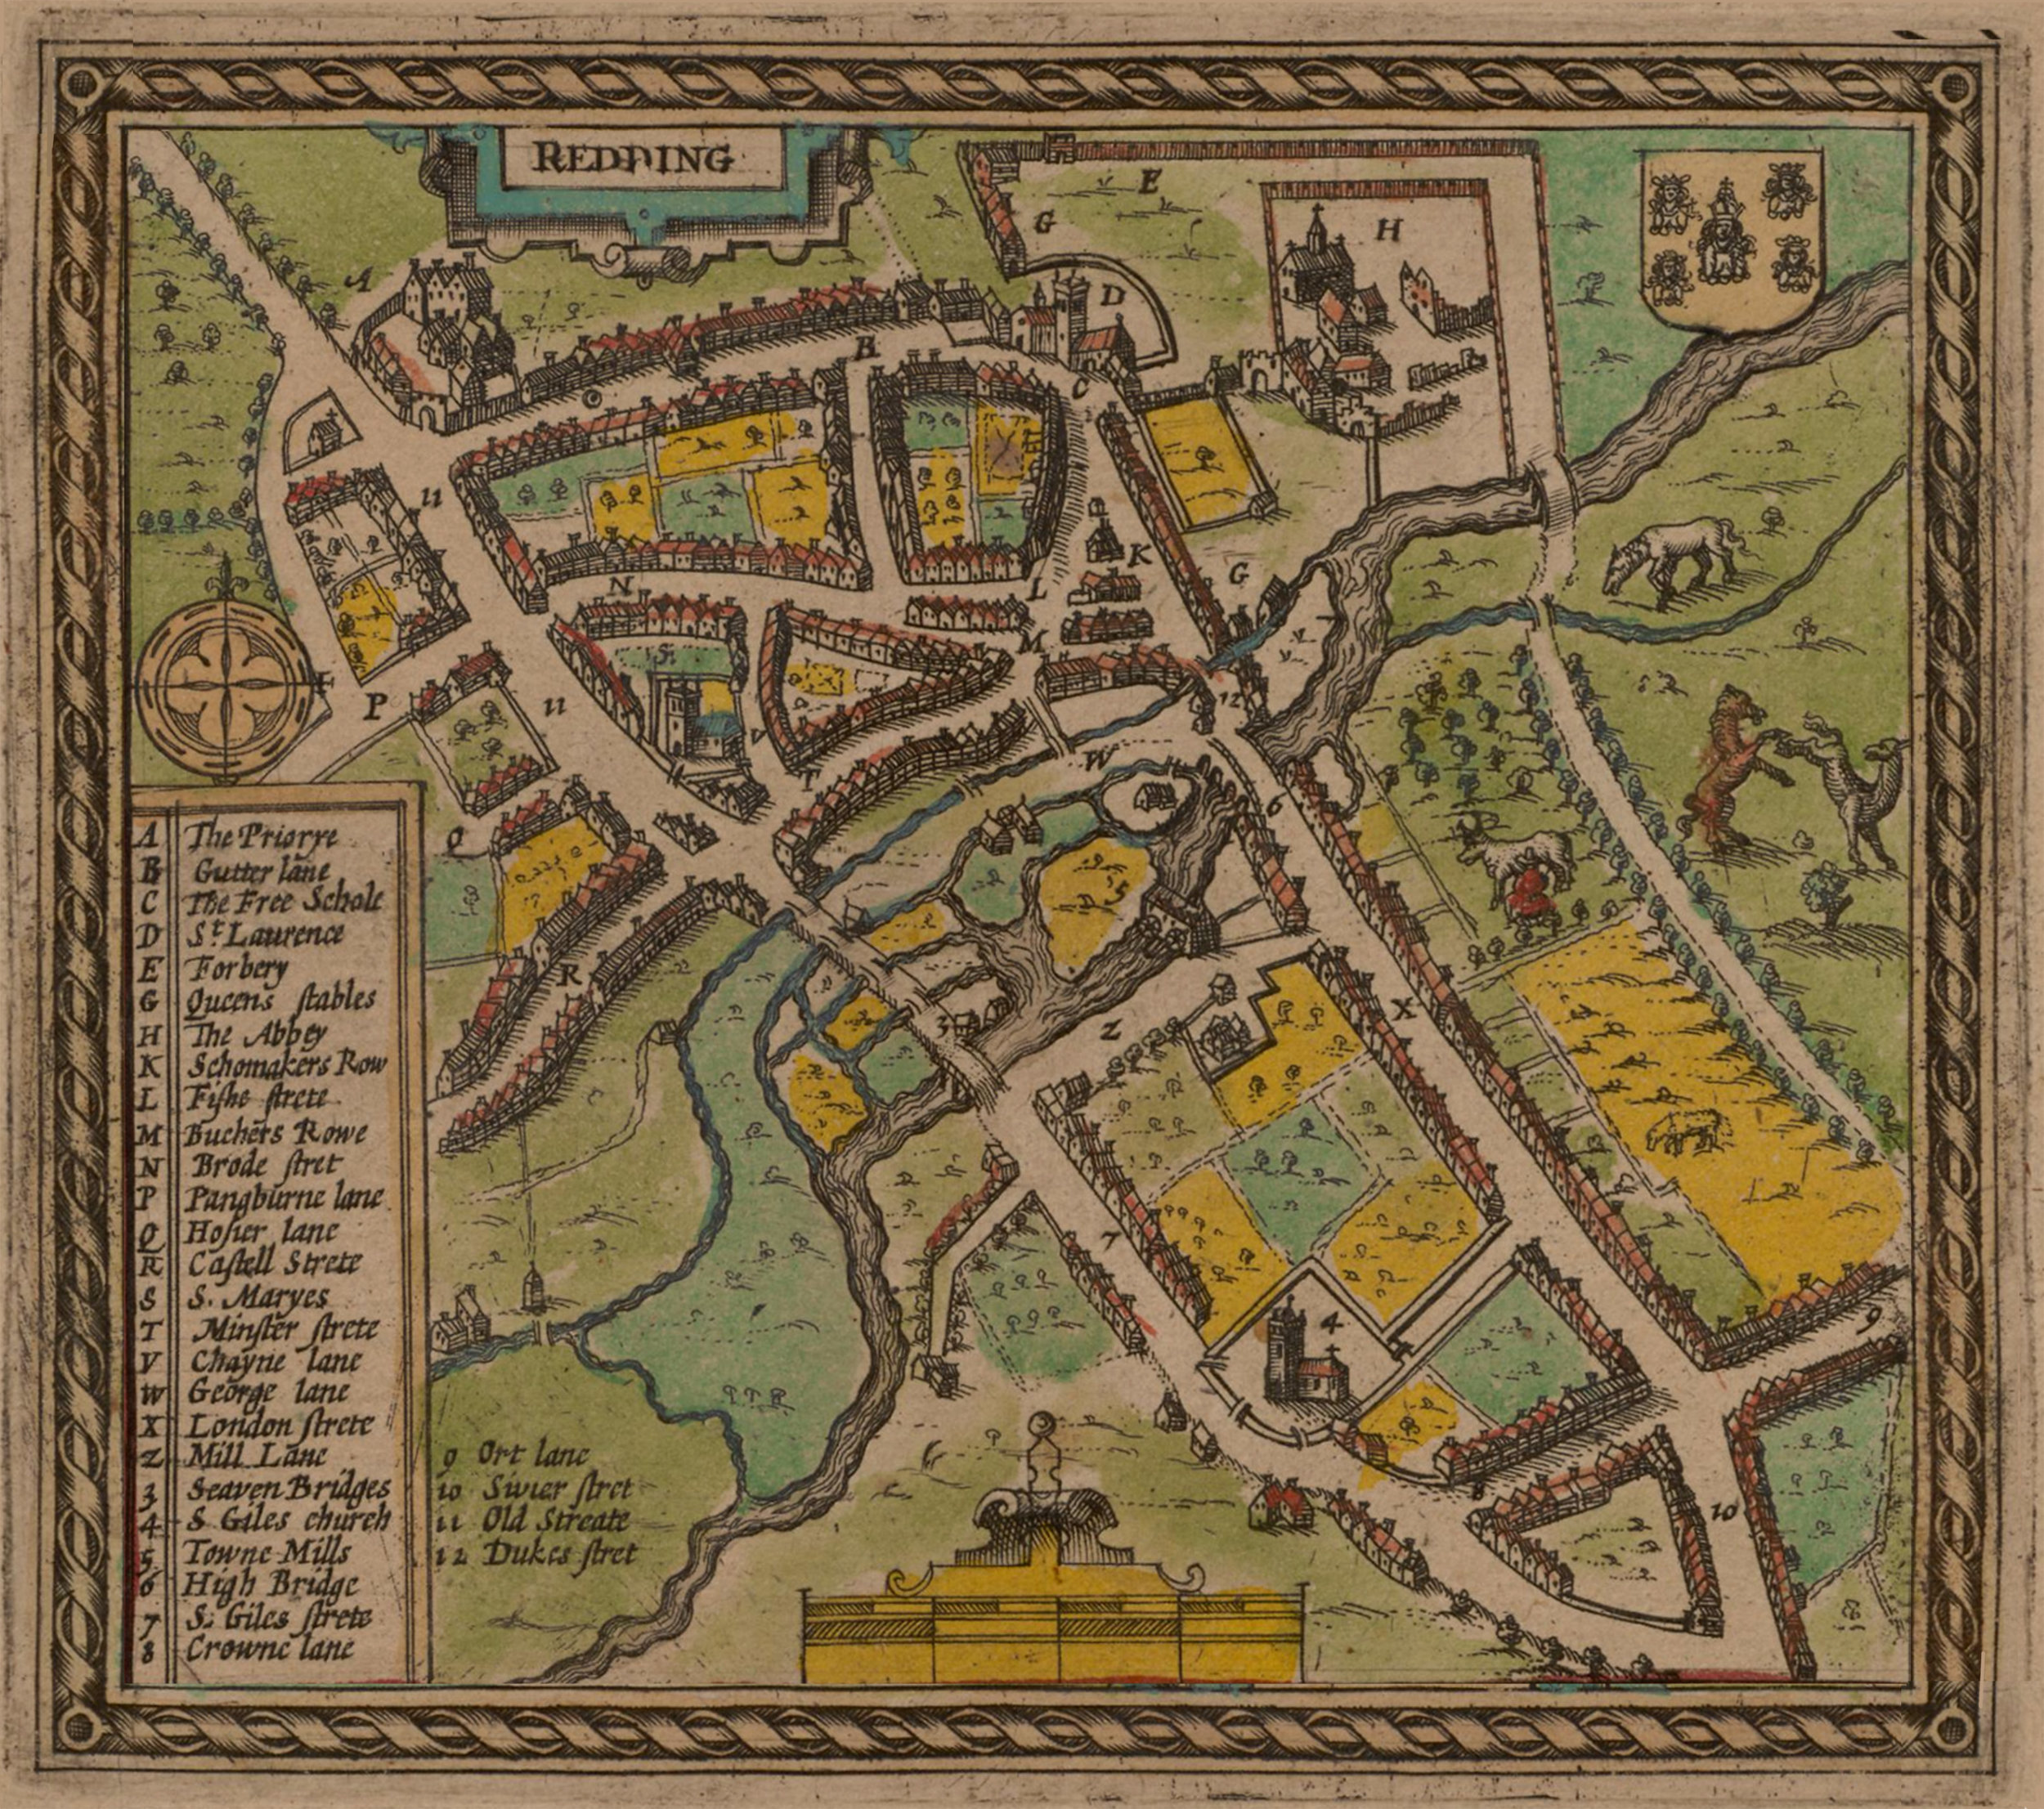 Map_of_Redding_by_John_Speed,_1611.jpg